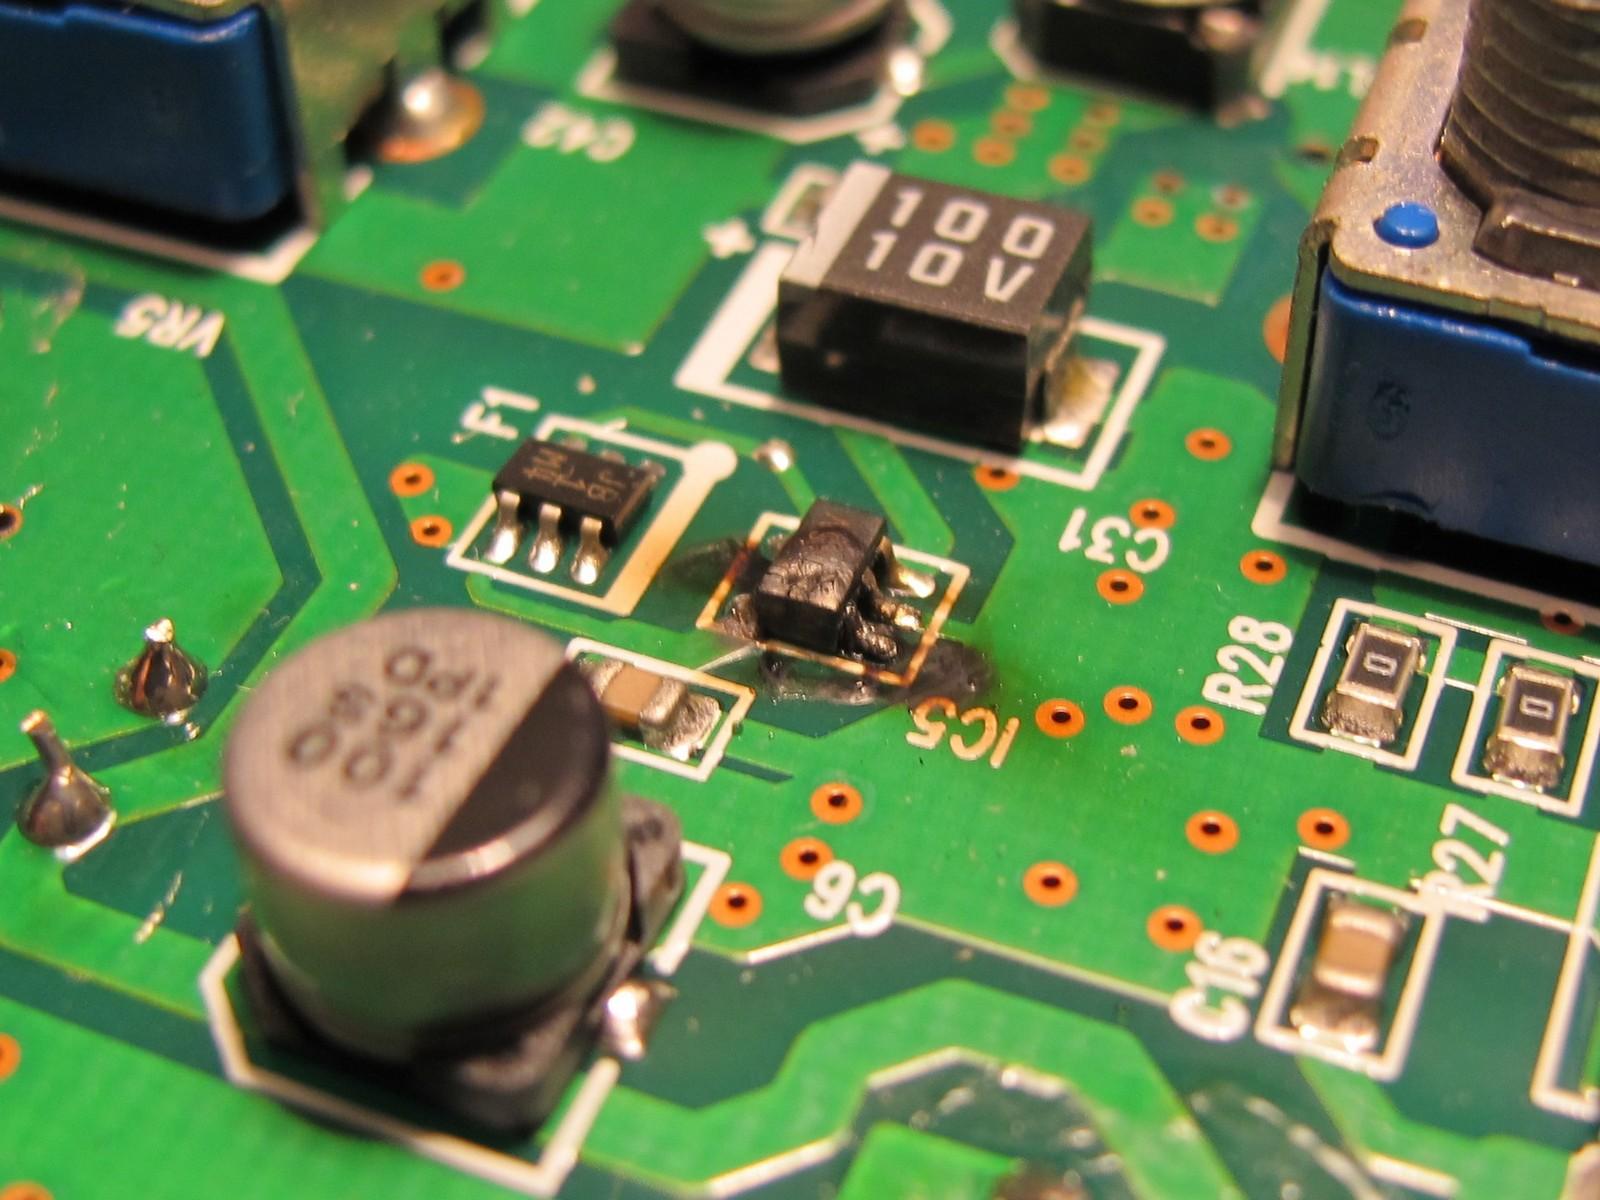 Burned switching regulator controller IC